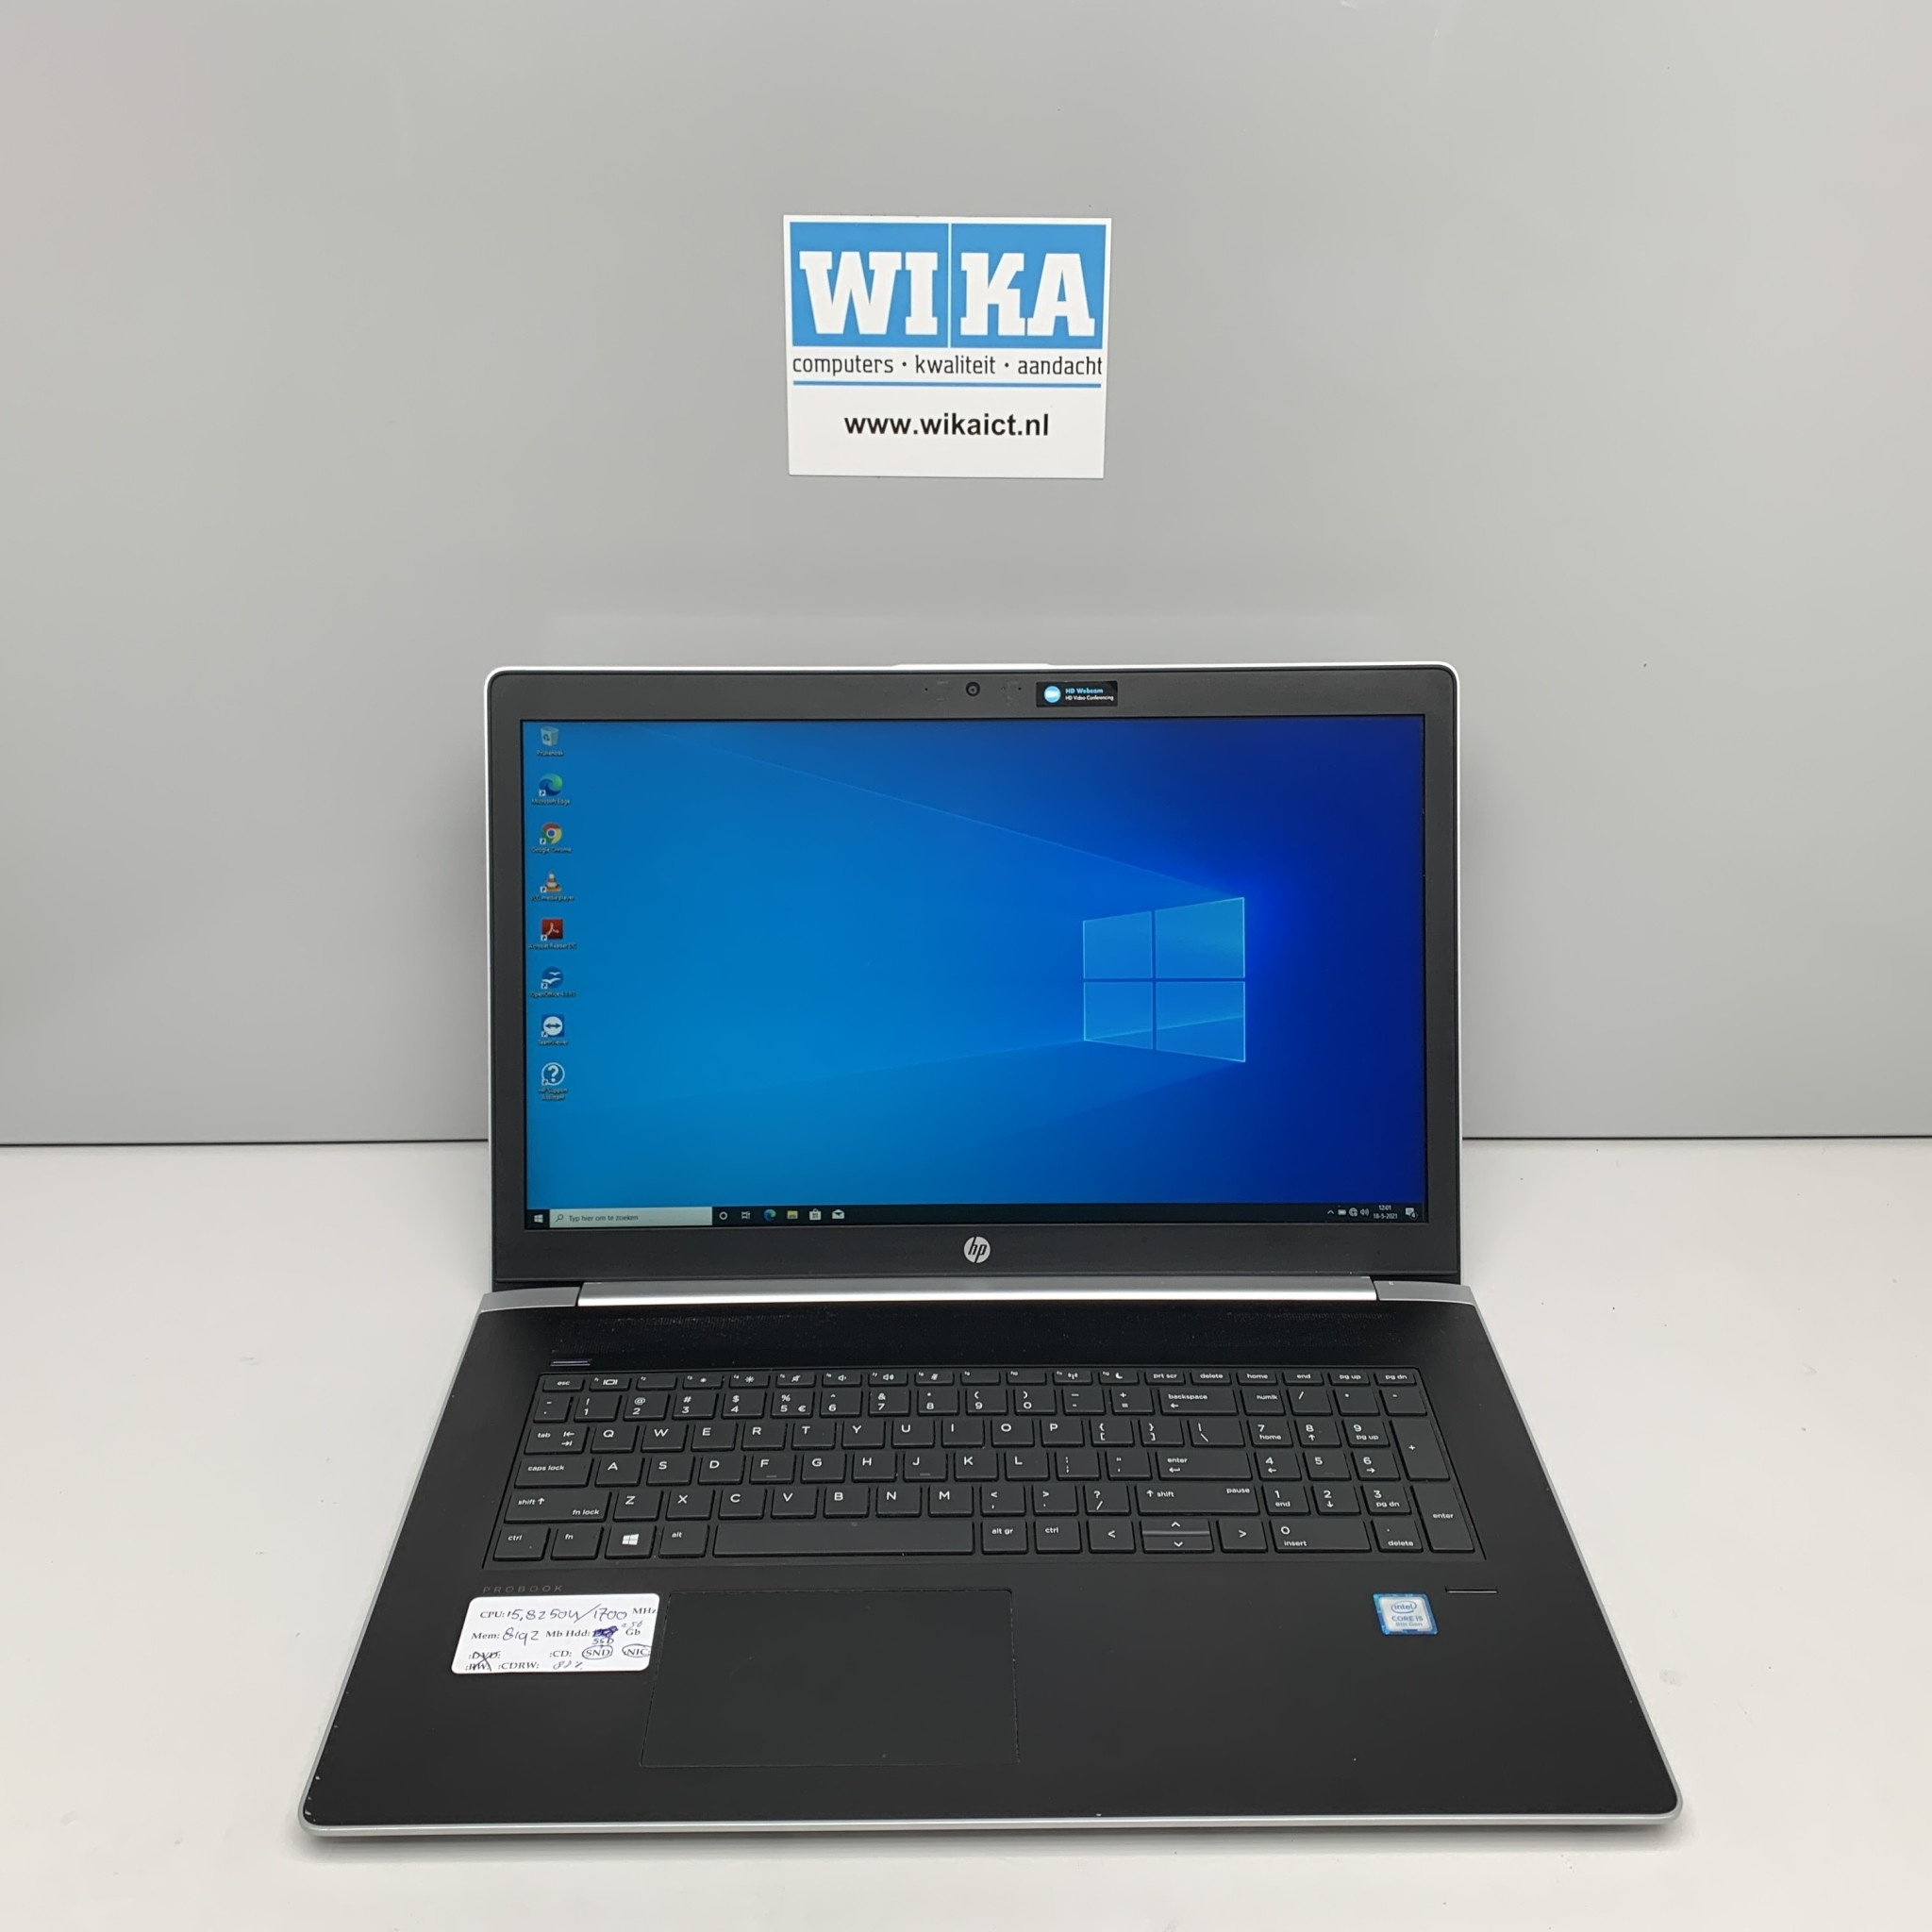 HP Probook 470 G5 I5-8250U 1.6Ghz 8Gb 256Gb SSD 17.3 inch  W10p laptop